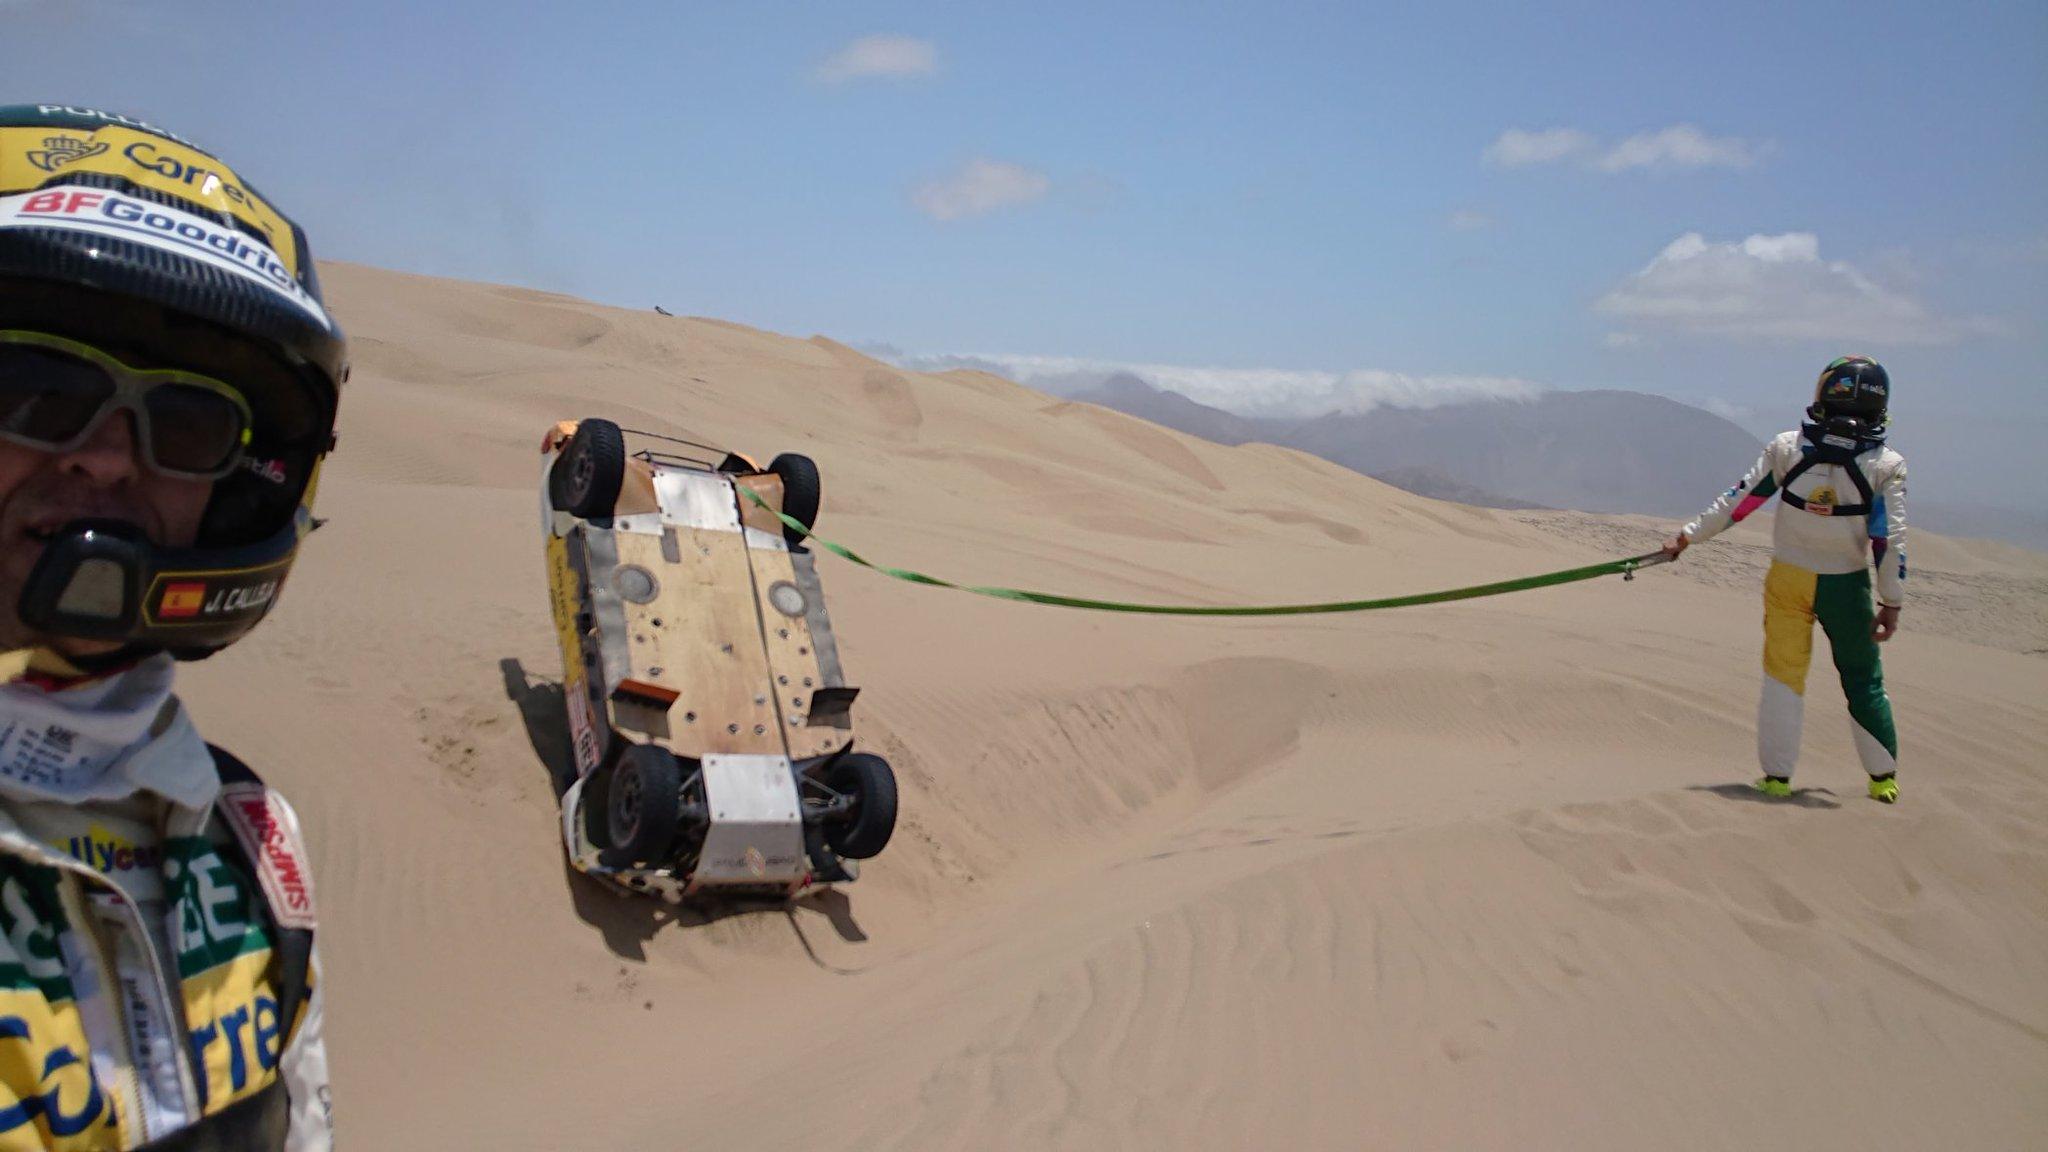 2019 41º Rallye Raid Dakar - Perú [6-17 Enero] - Página 8 Dw0q-aHXgAARBnp